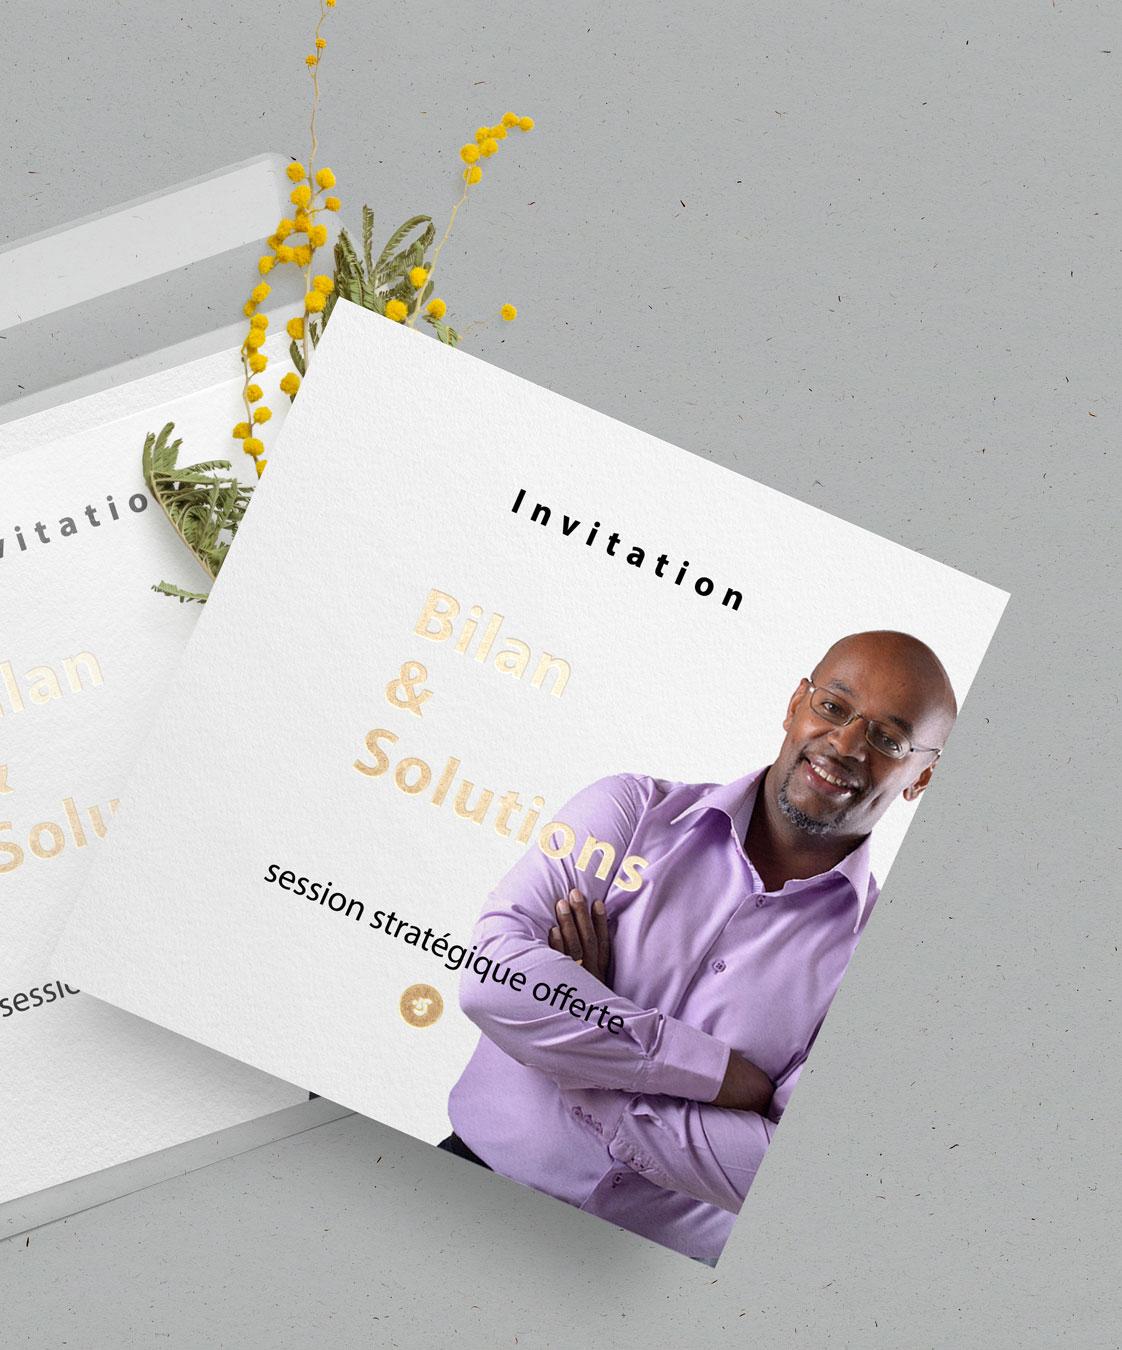 invitation-session